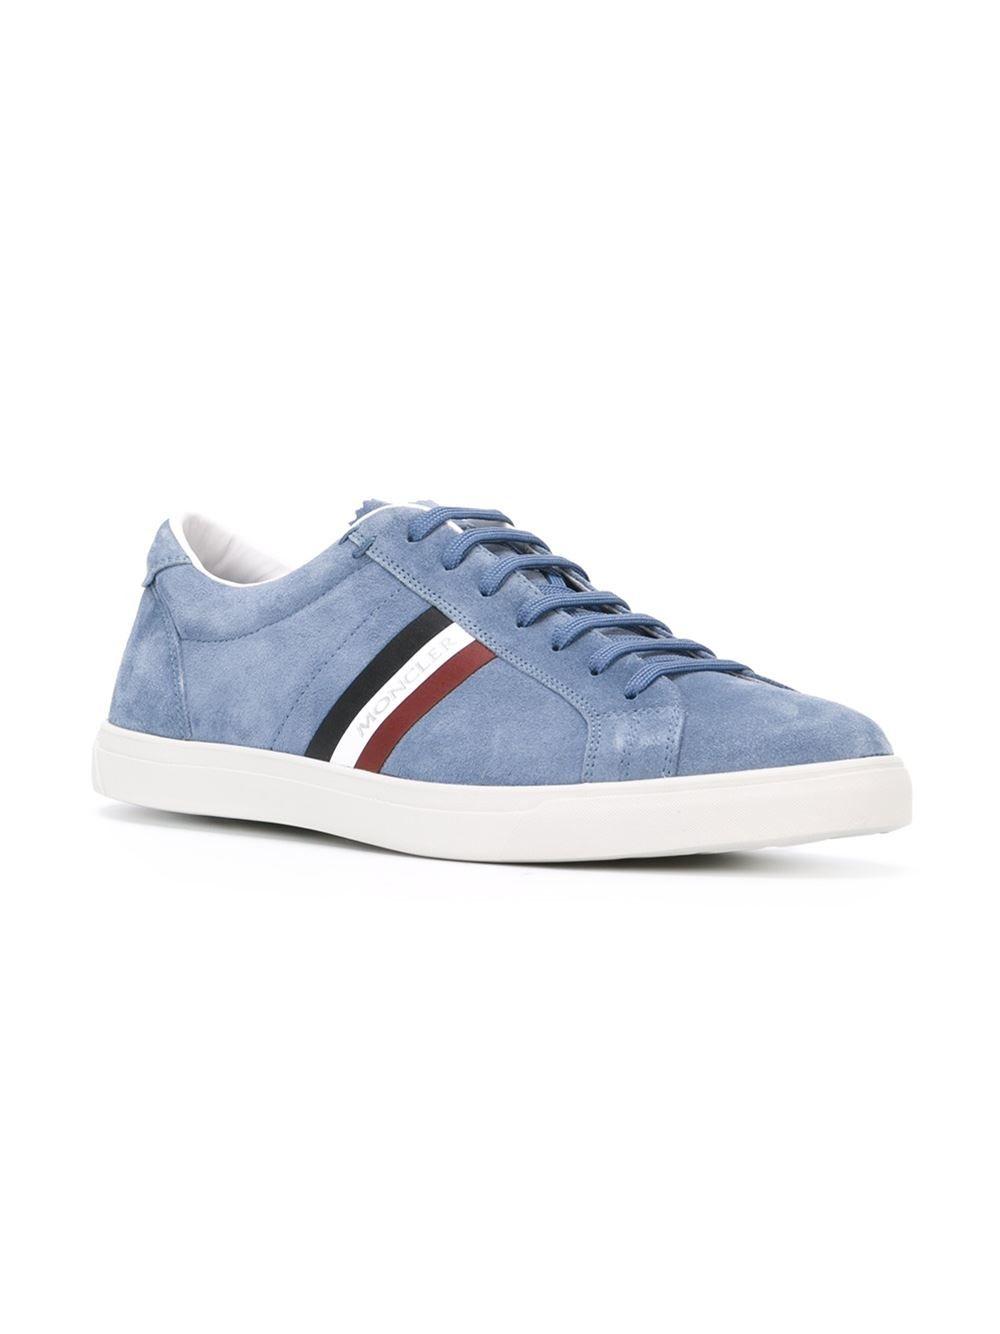 #moncler #sneakers #monaco #blue #suede #man #fashion www.